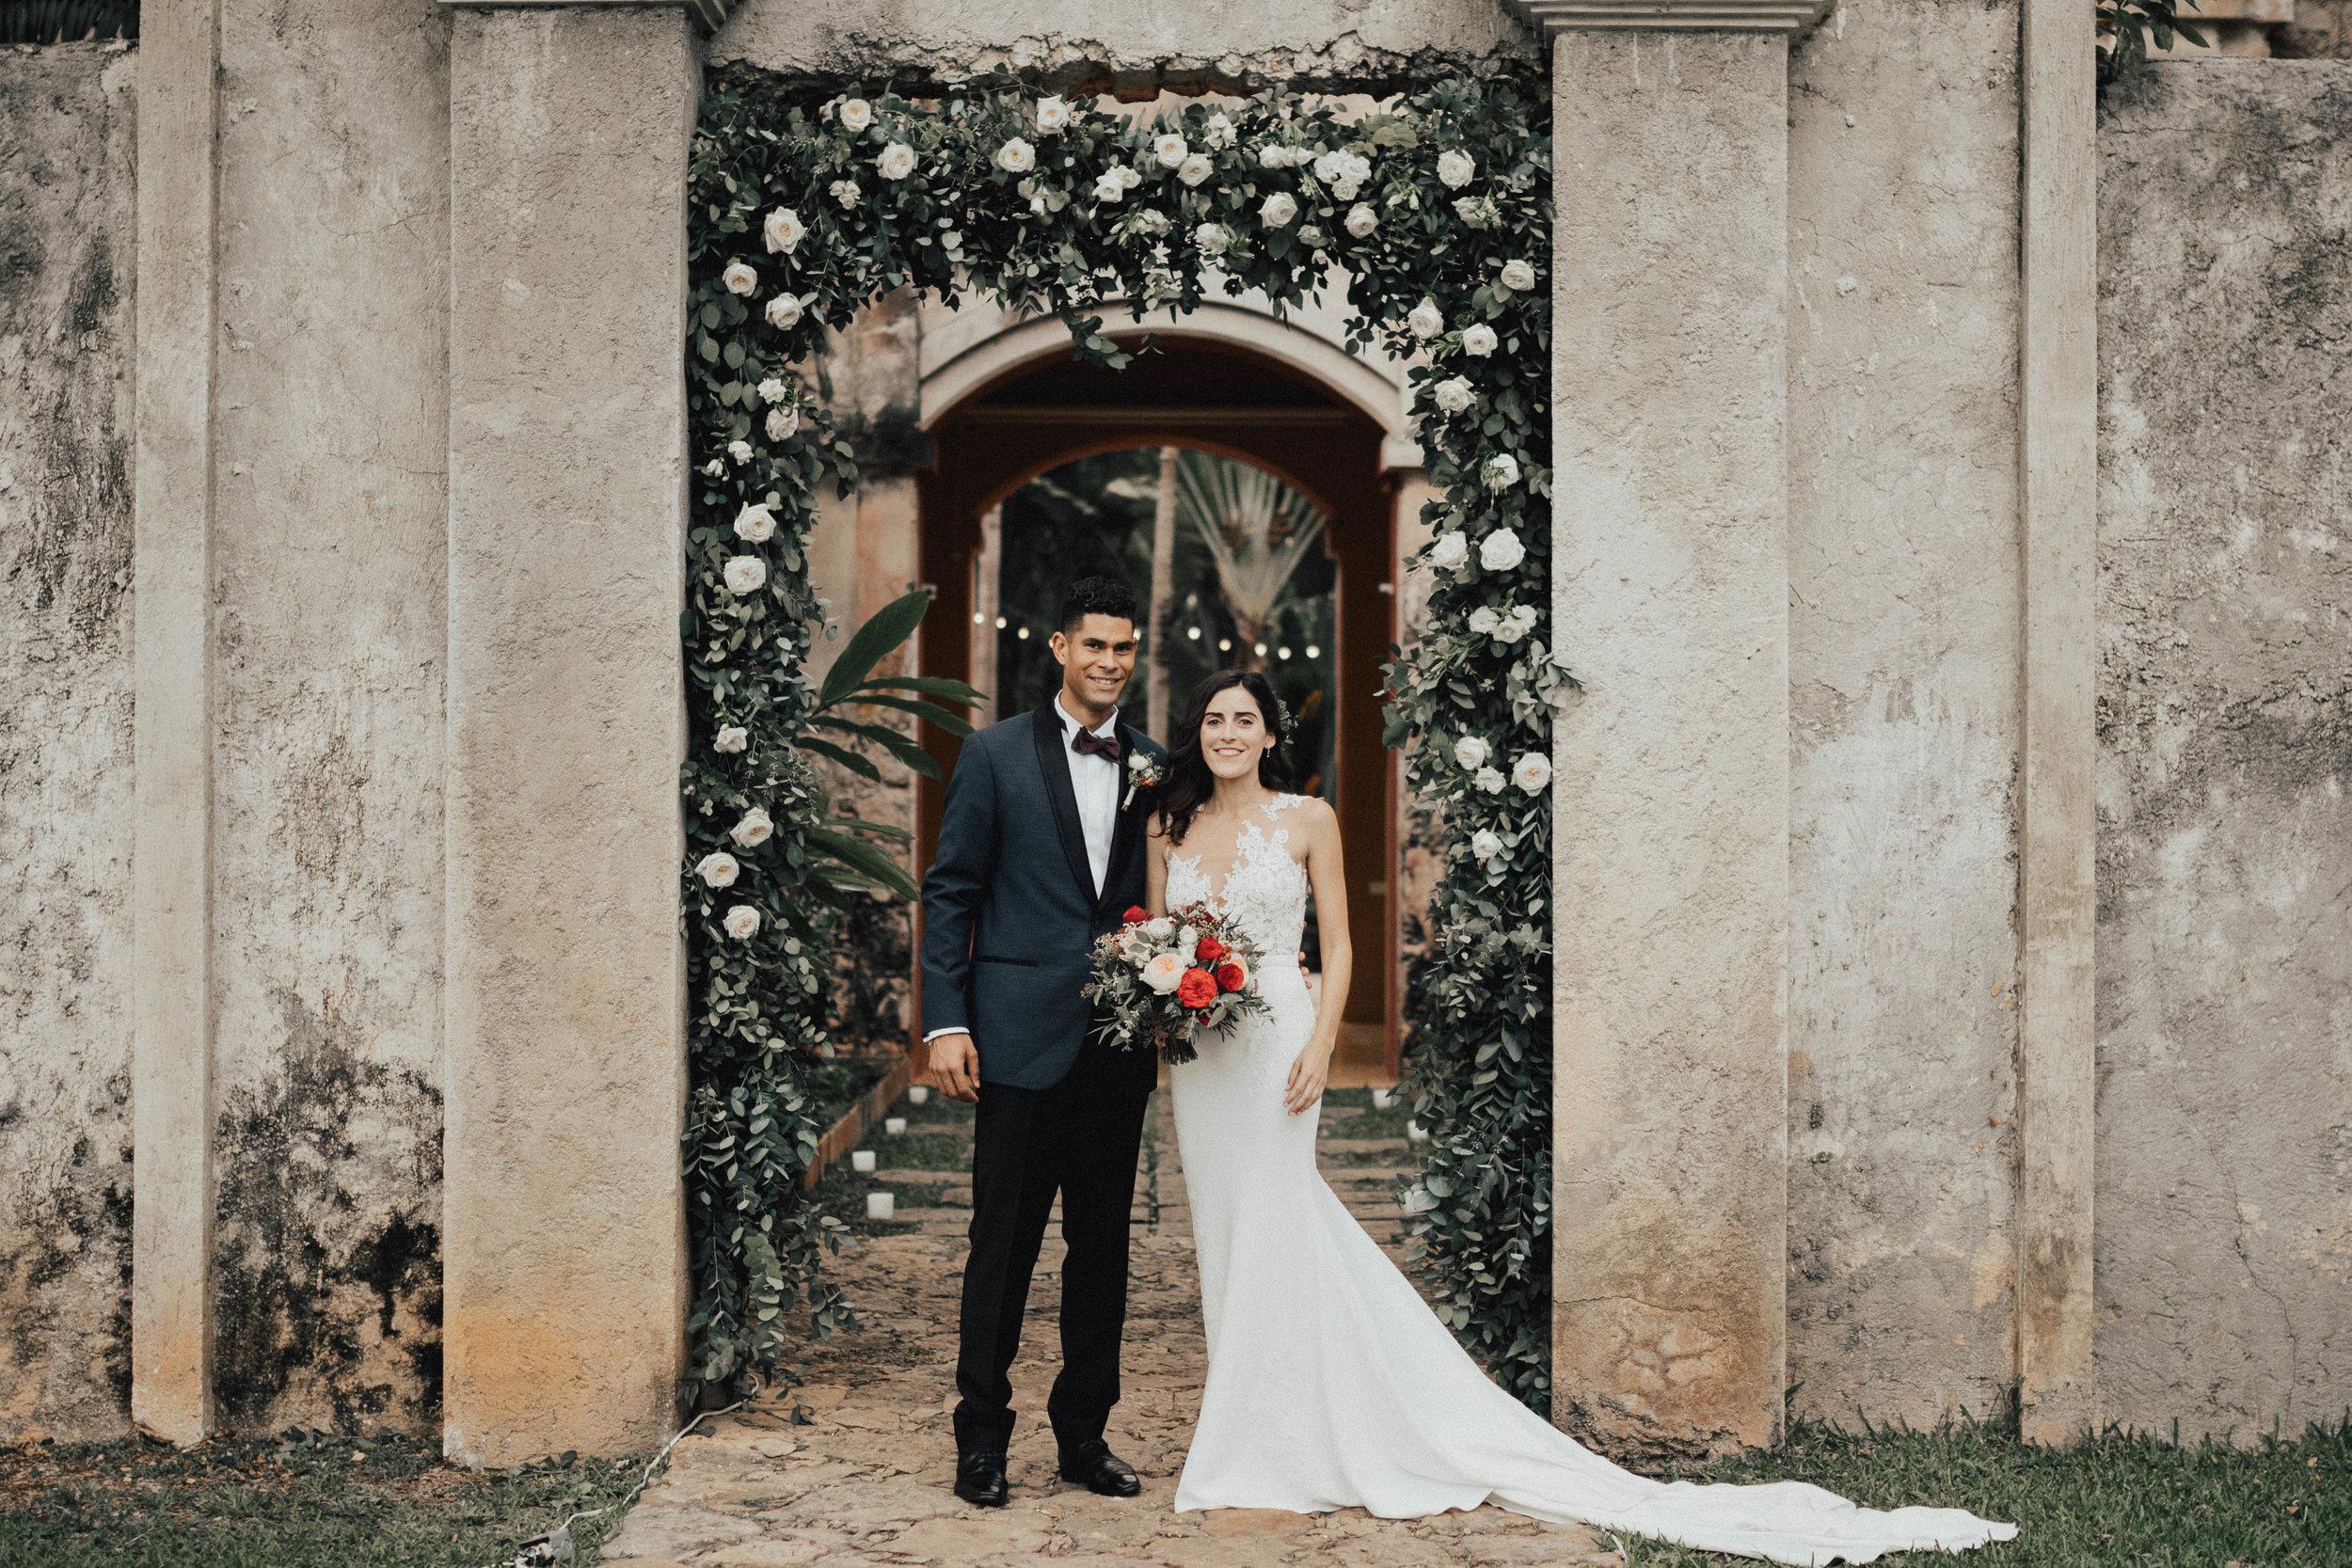 4 ceremony Tina Kai Merida Mexico Wedding  (192 of 134).jpg